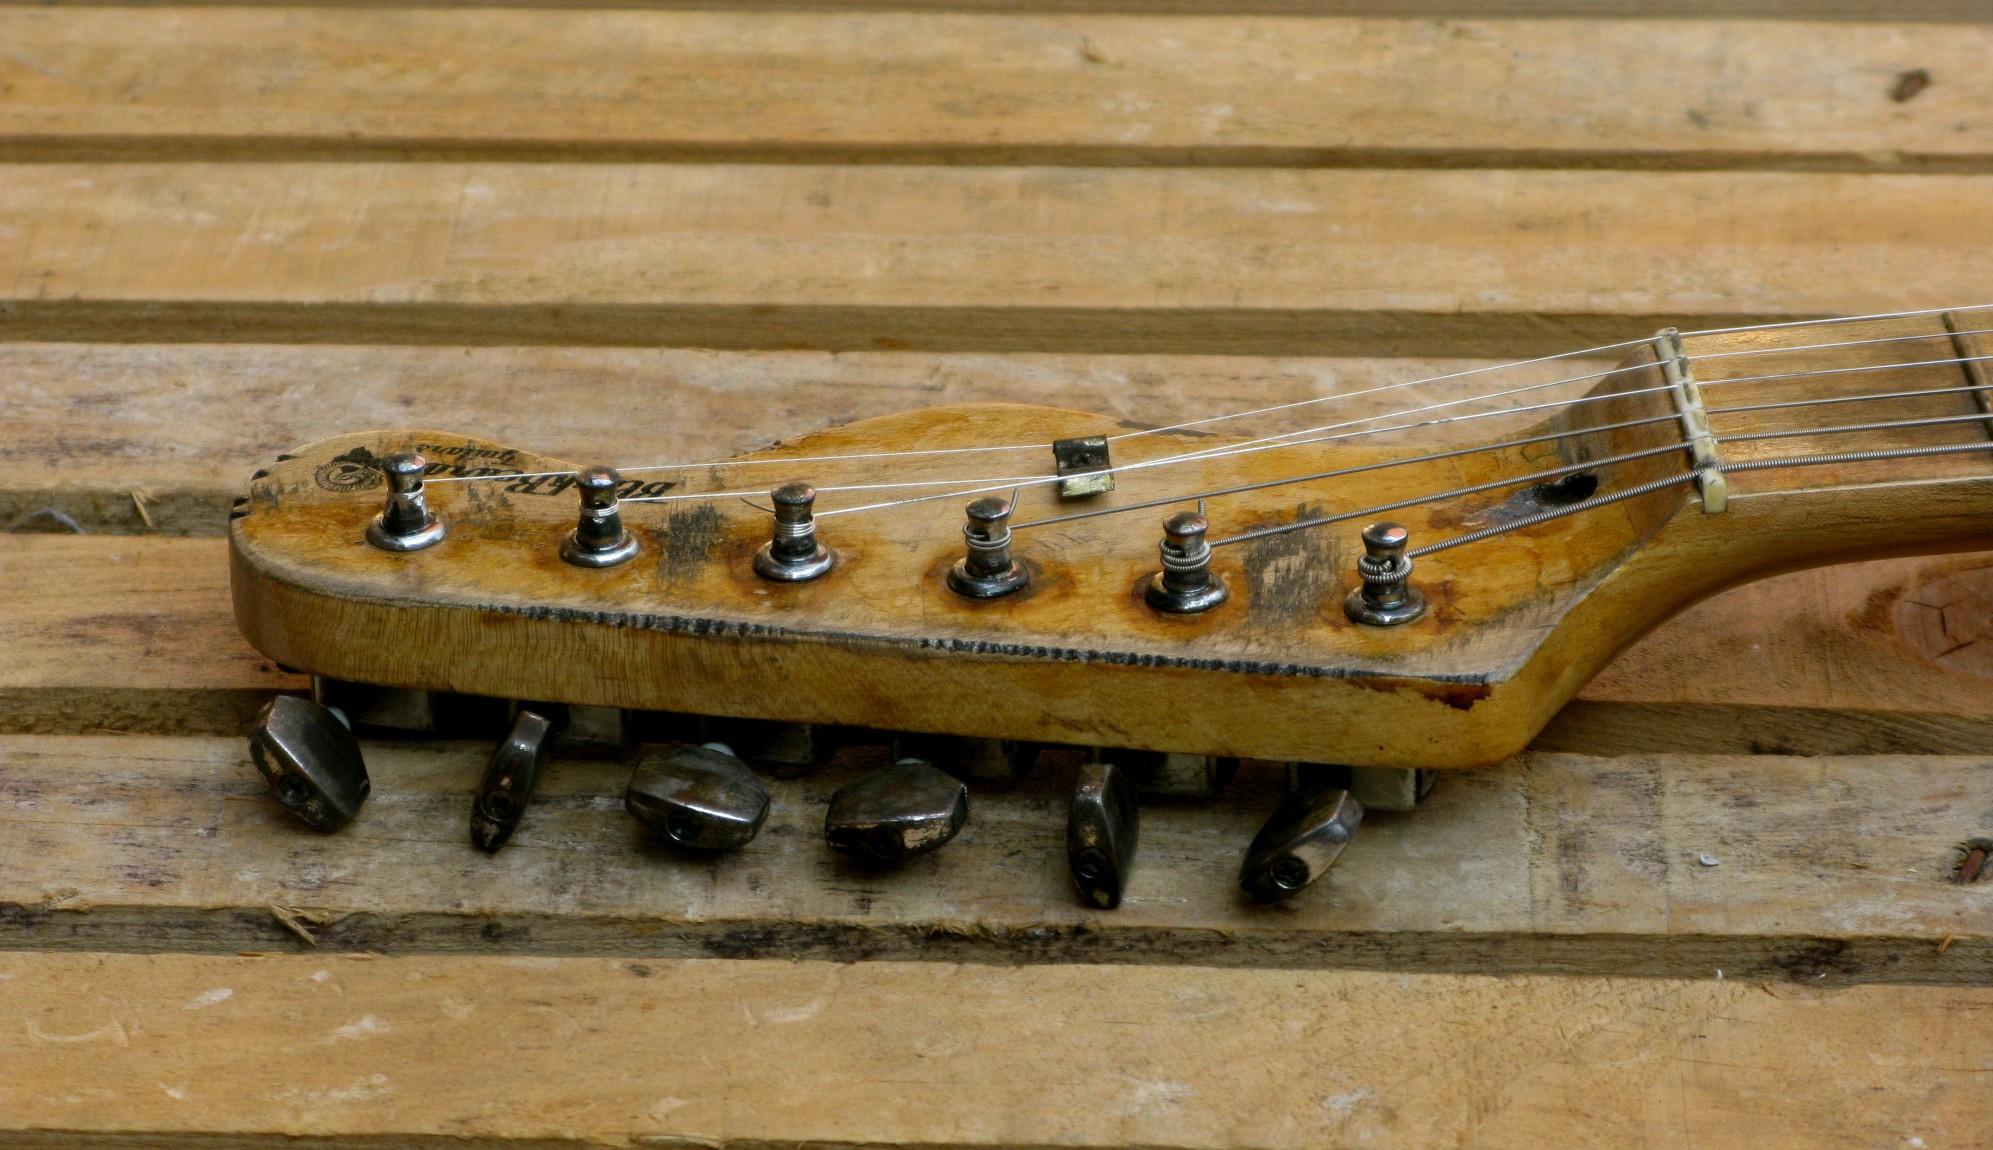 Paletta di una chitarra elettrica in pioppo